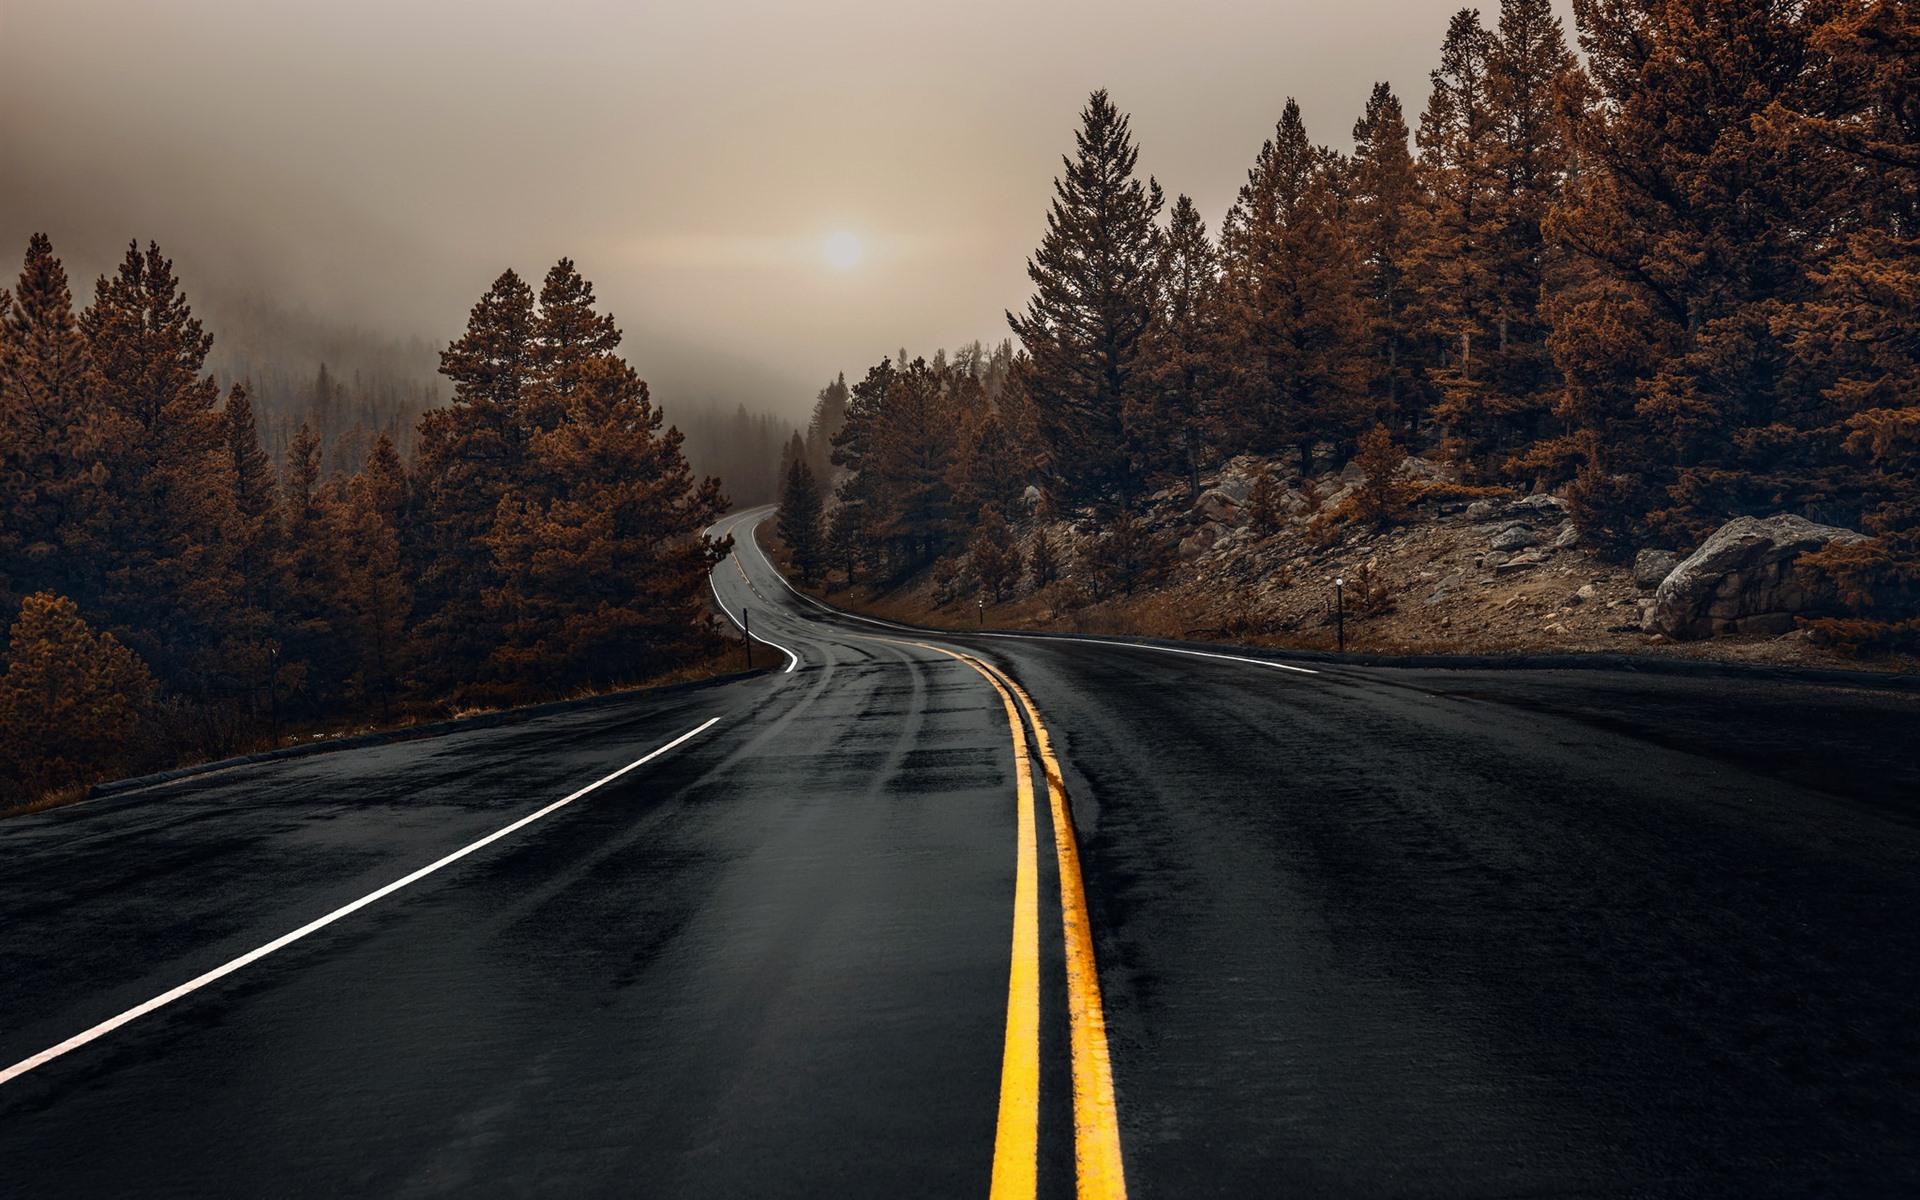 Wallpaper Wet Road Trees Fog Morning Autumn 1920x1200 Hd